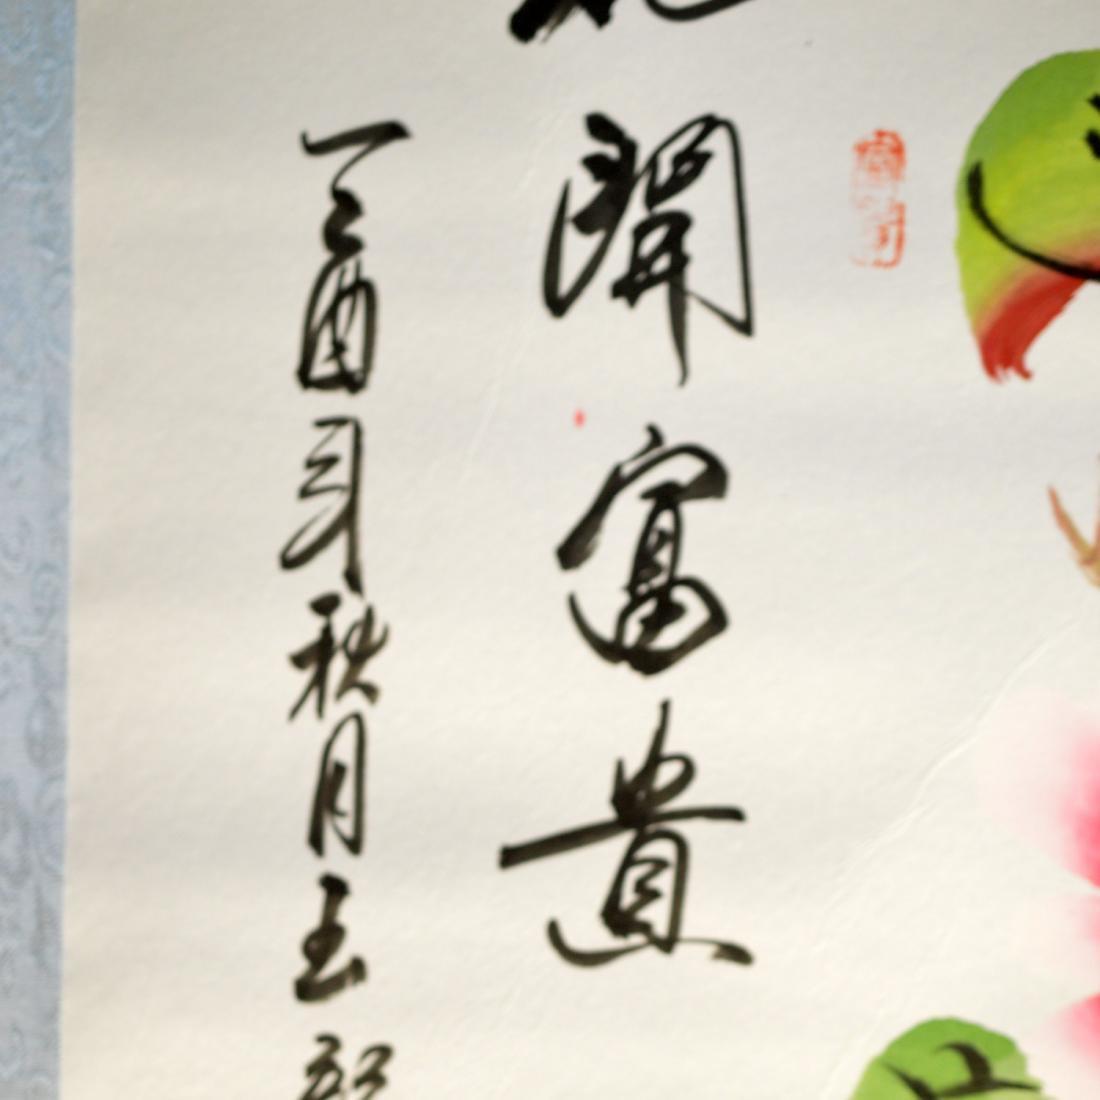 Flower Blossom Painting - 4